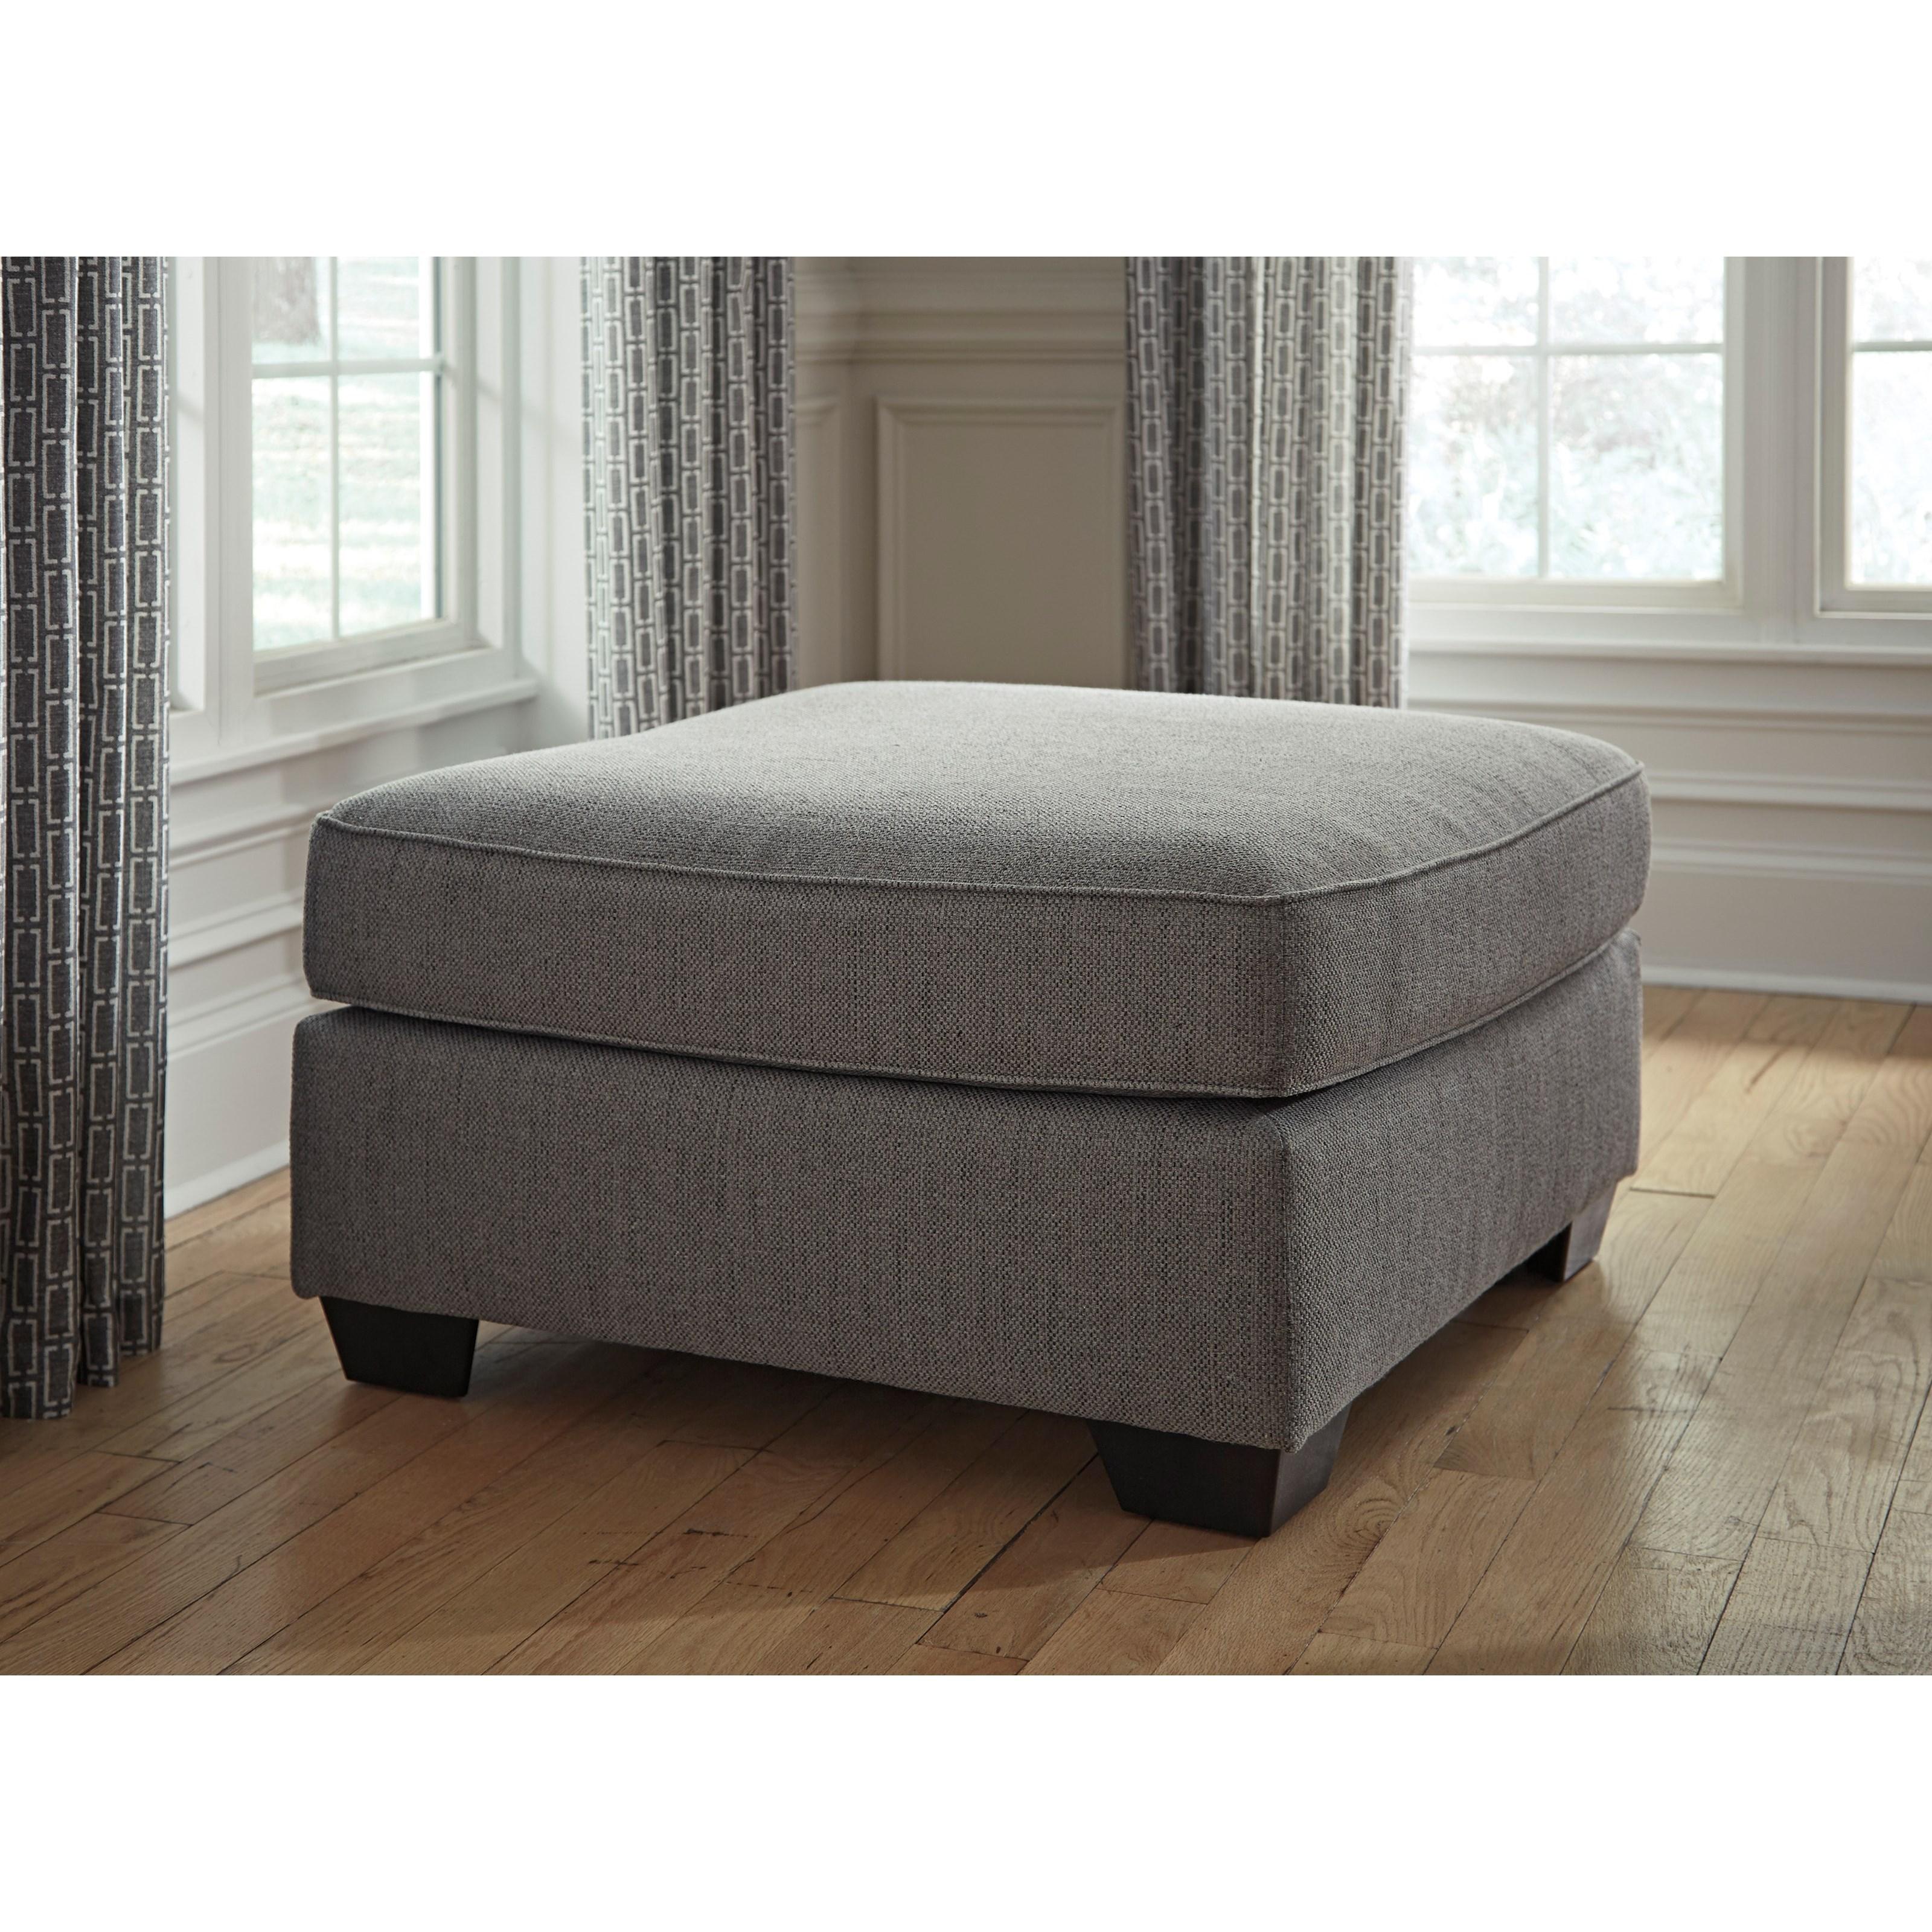 Ashley Furniture Outlet Charlotte: Ashley Furniture Larusi Oversized Accent Ottoman